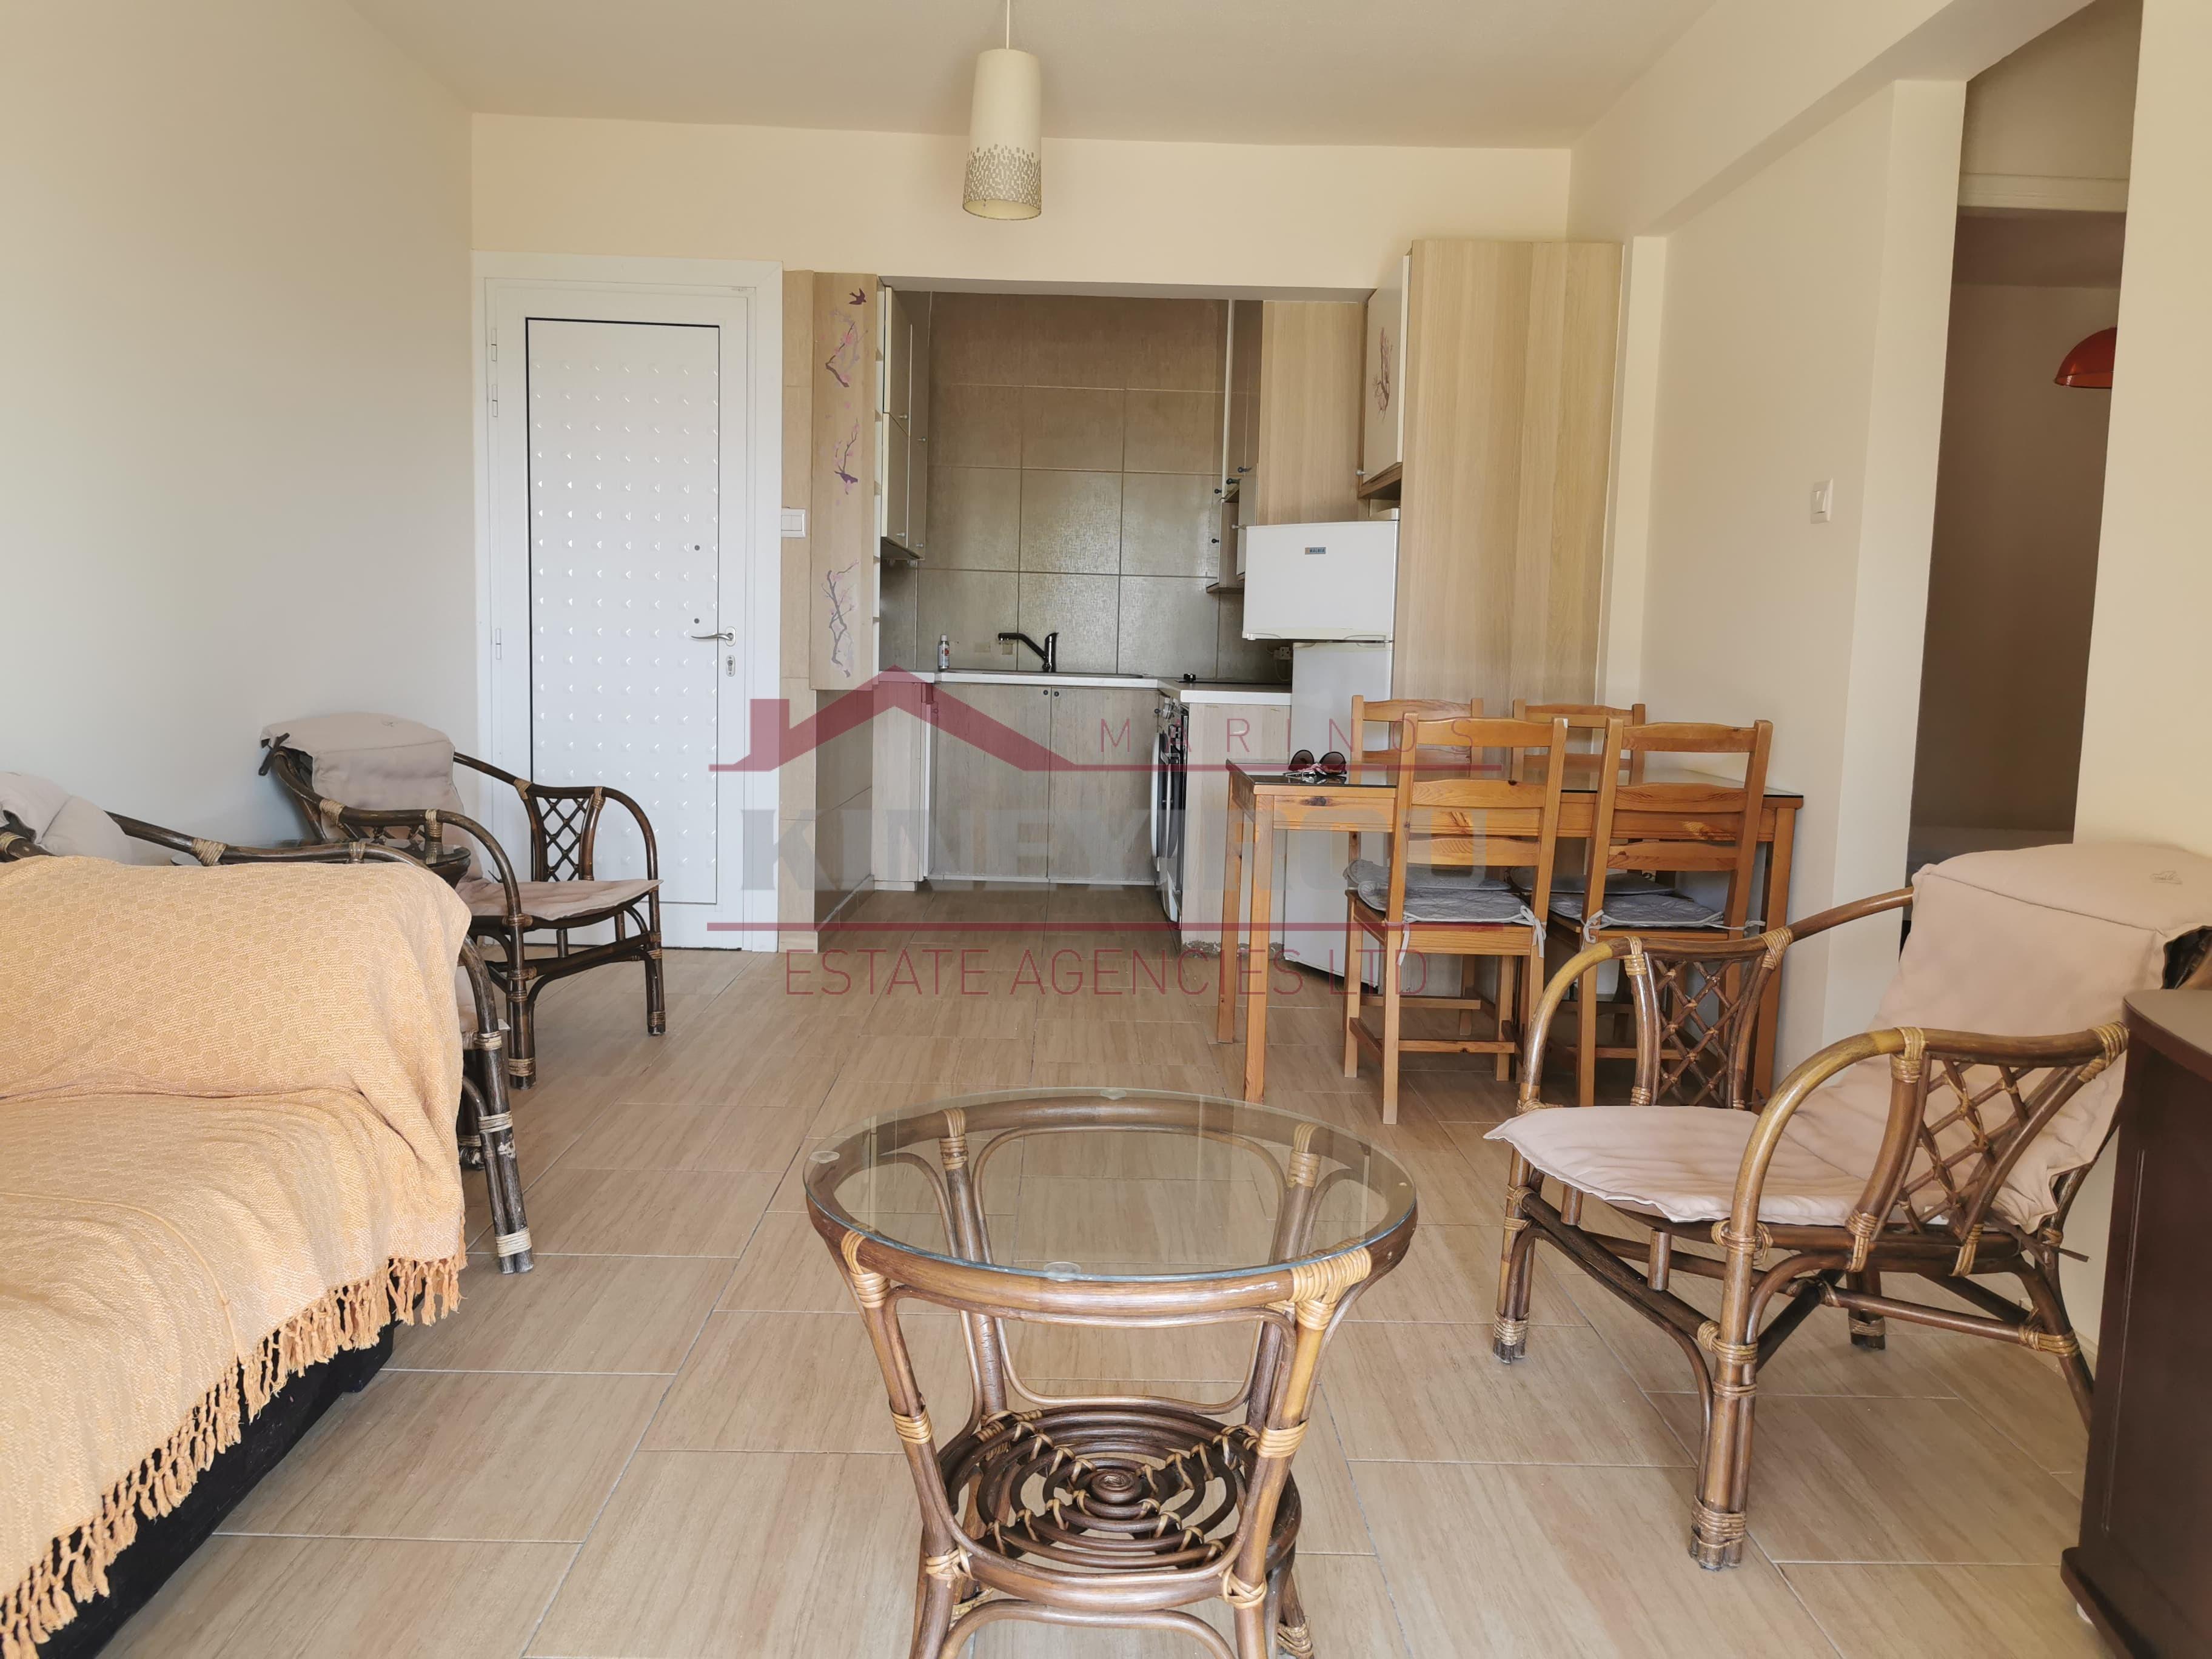 2 Bedroom Apartment in Dekelia Road, Larnaca